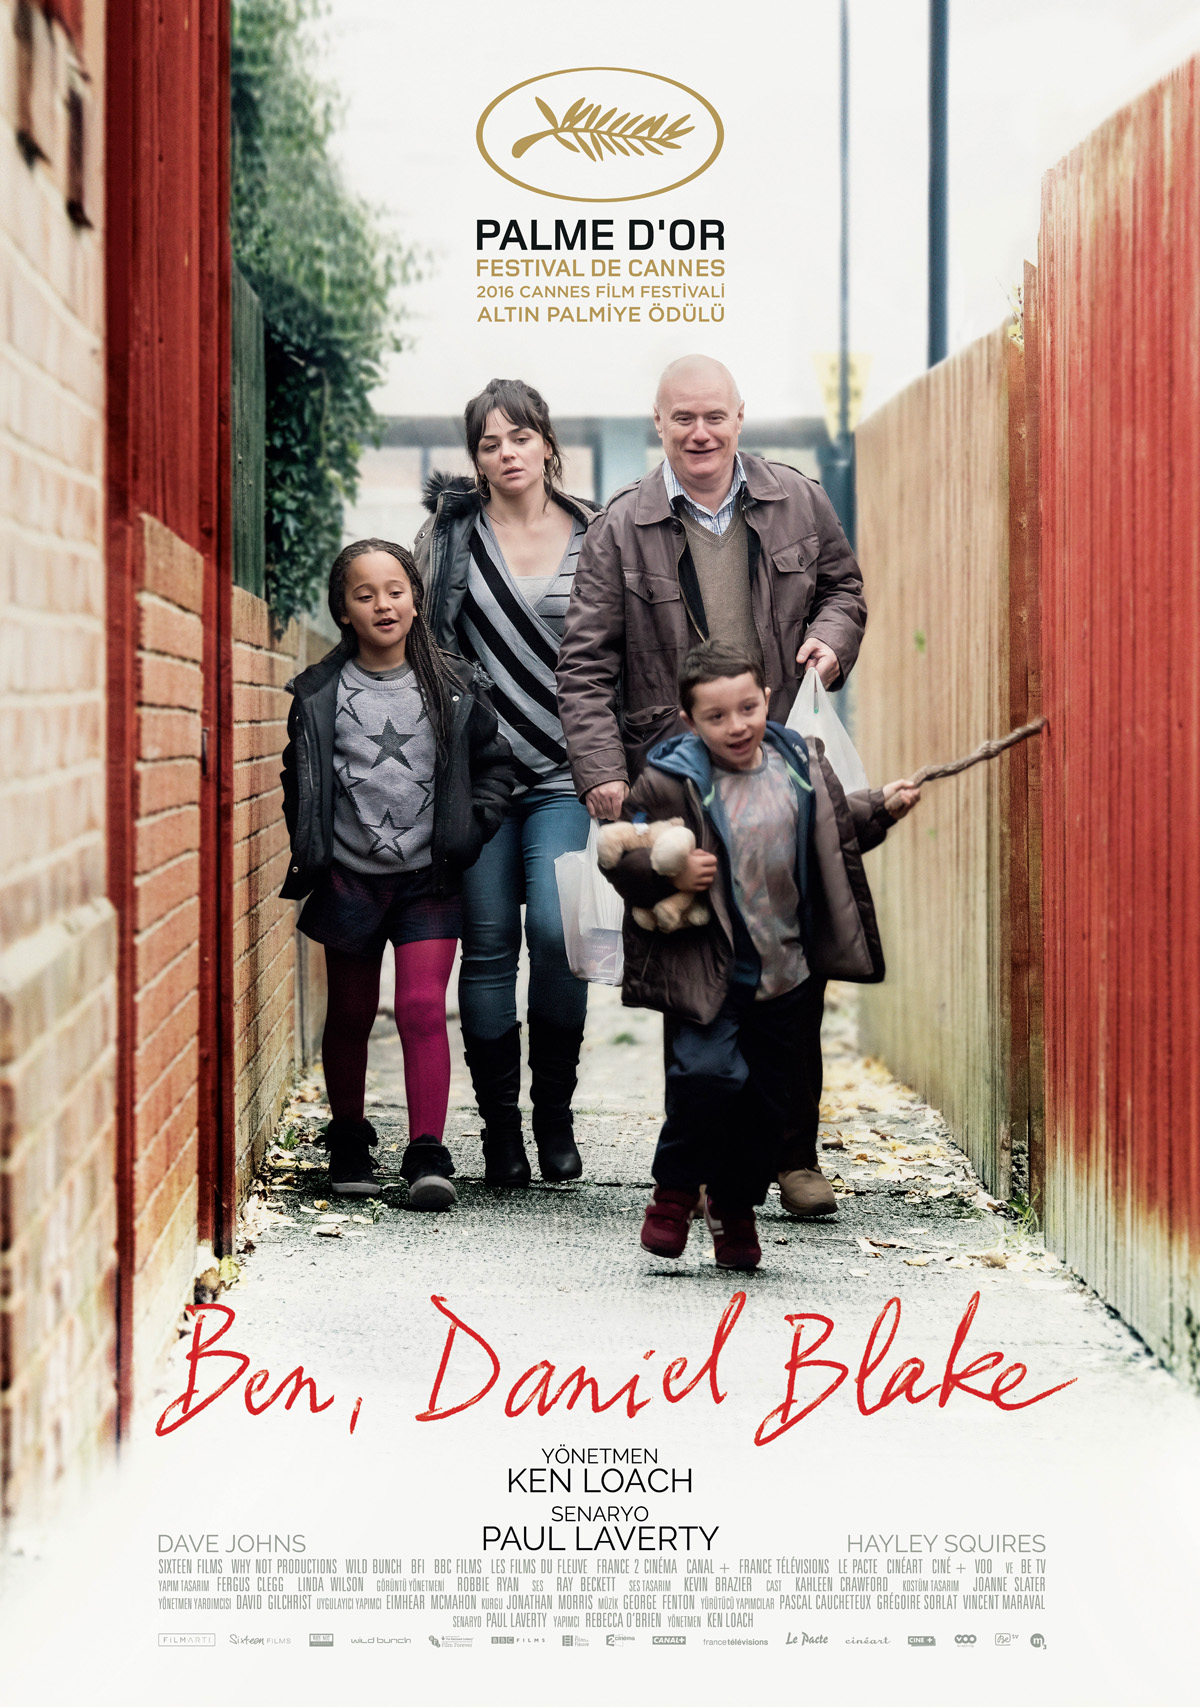 ben_daniel_blake